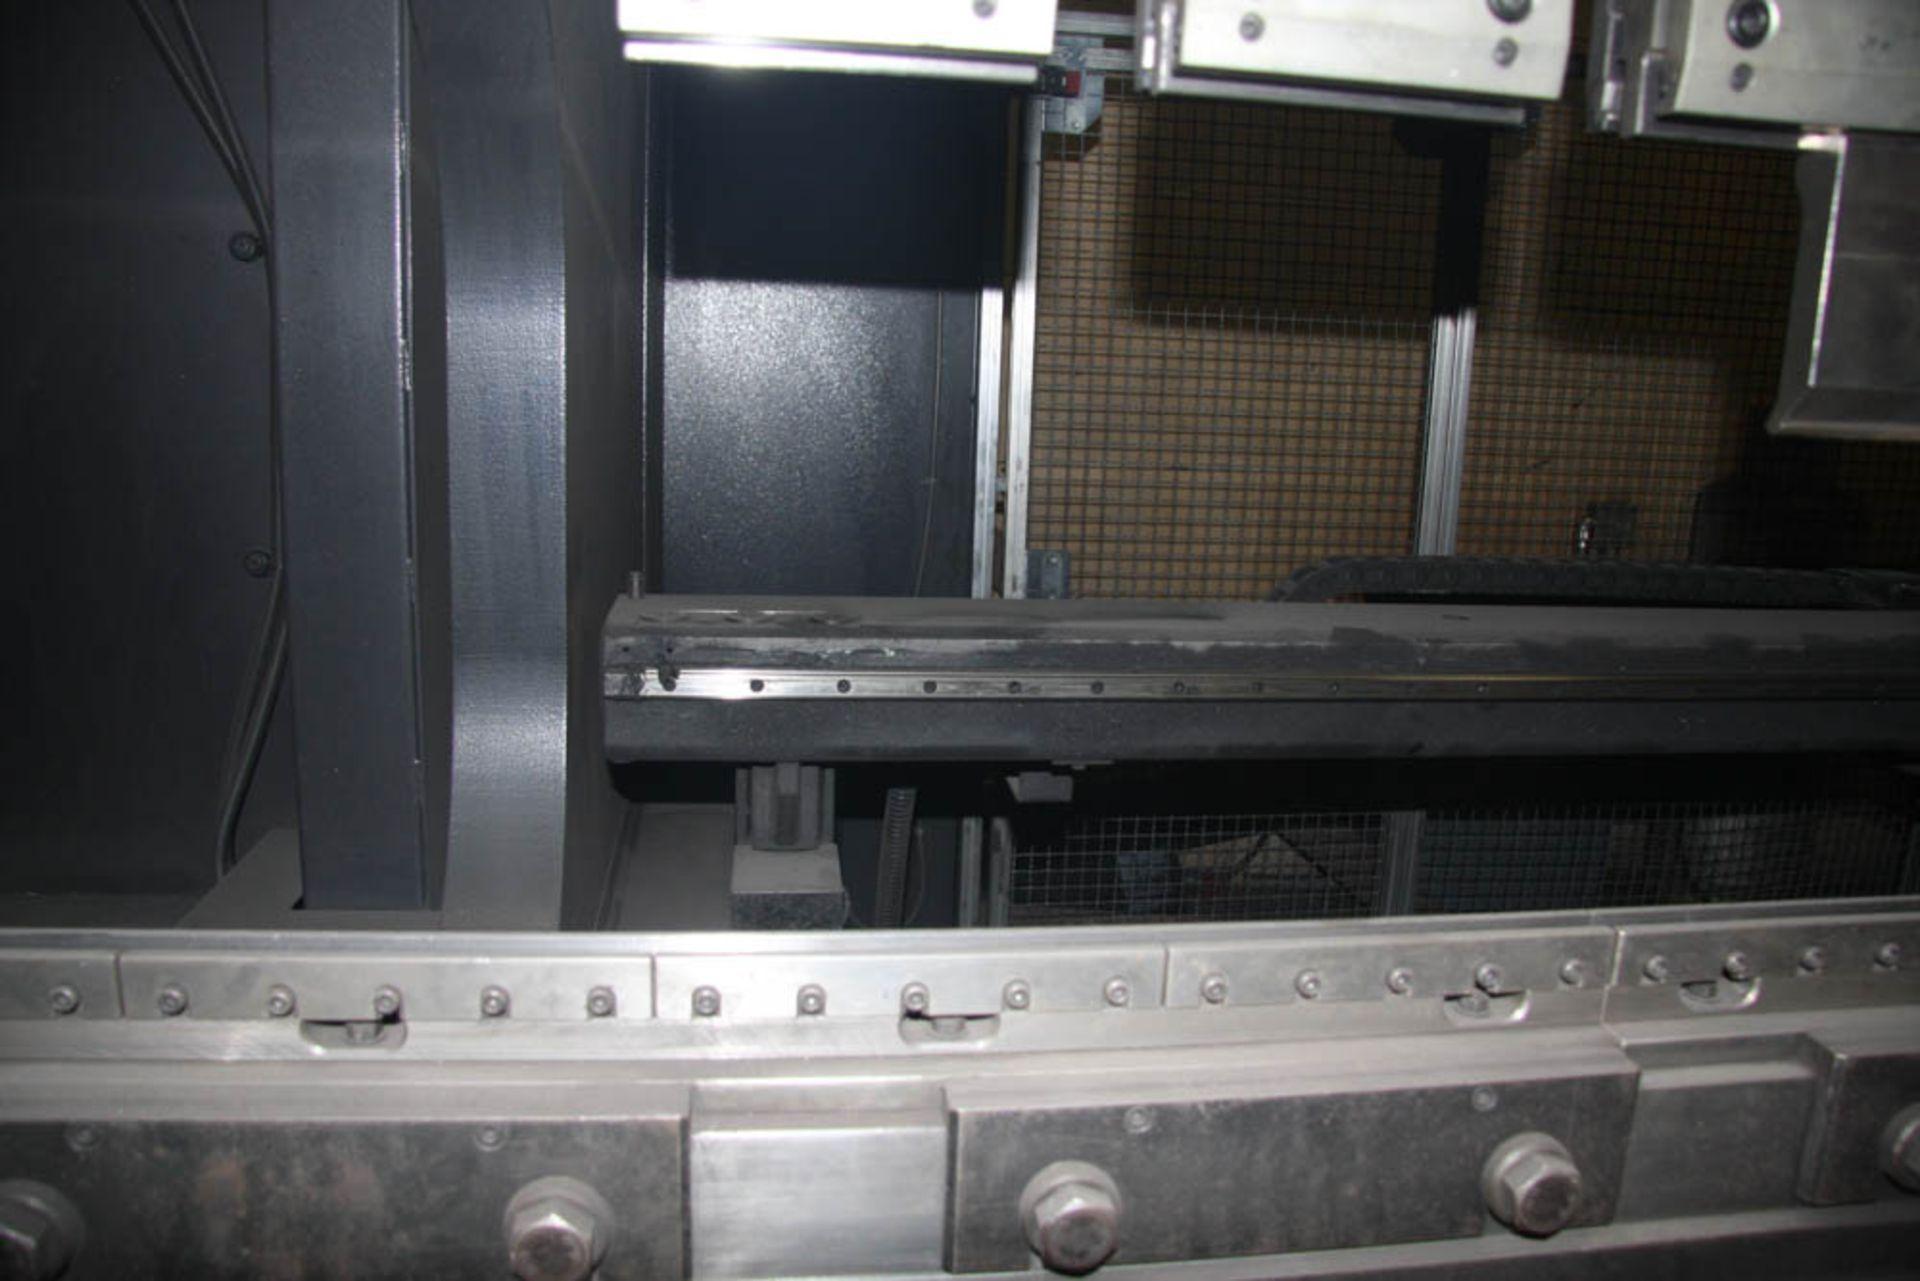 "2015 187 US TON X 122"" AMADA MDL. HG1703 CNC PRESS BRAKE, AMNC 3i CONTROL, 122"" MAX BEND LENGTH - Image 6 of 14"